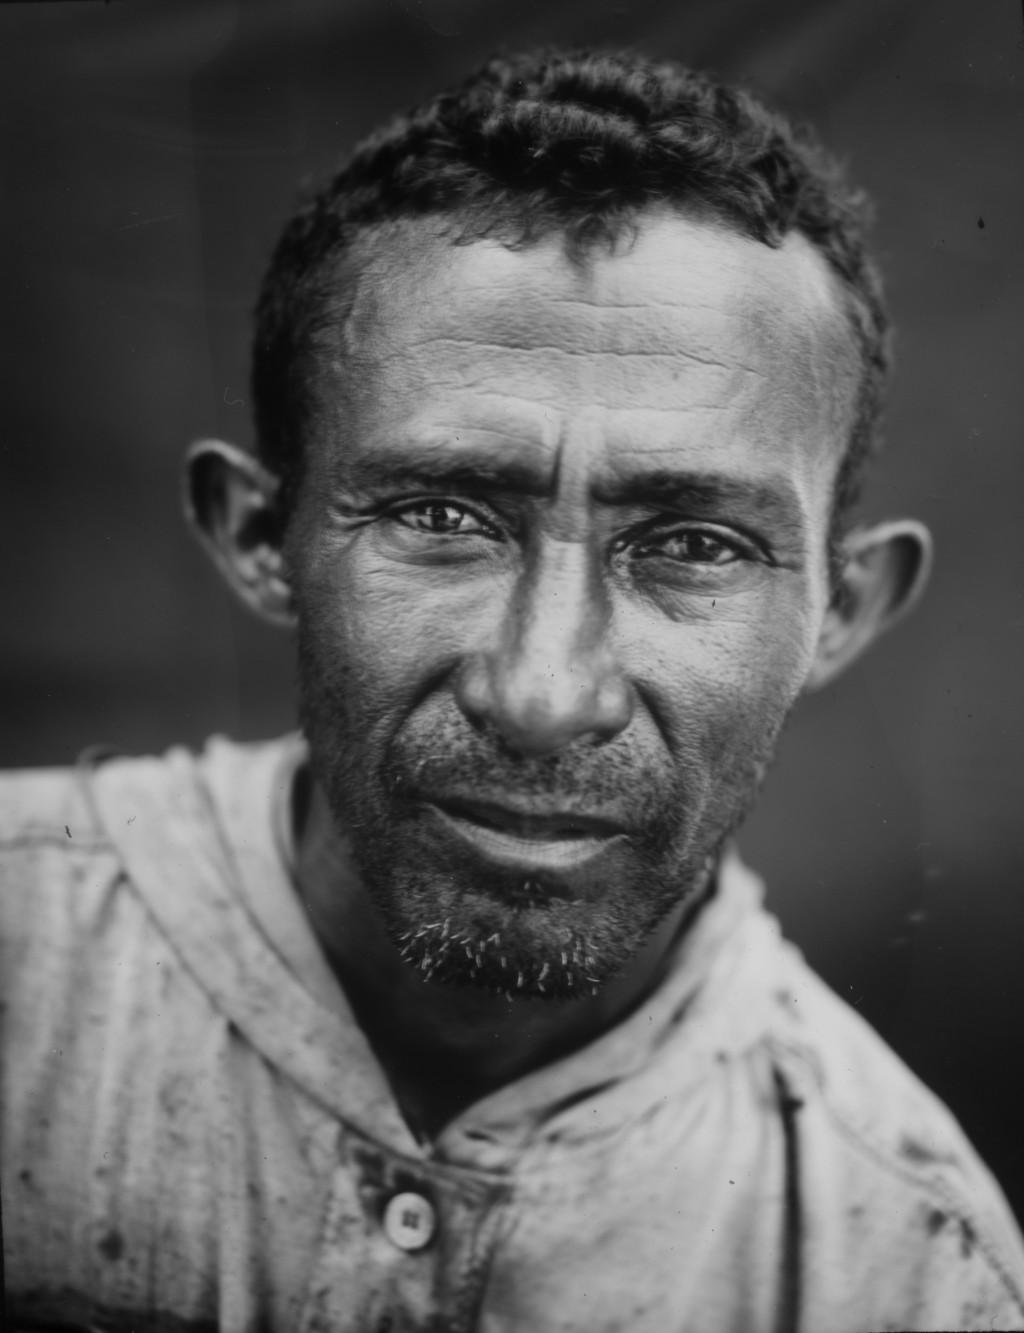 Fisherman Juzman Garcia poses for a portrait after his workday on oil-contaminated Lake Maracaibo in Cabimas, Venezuela, July 3, 2019. (AP Photo/Rodri